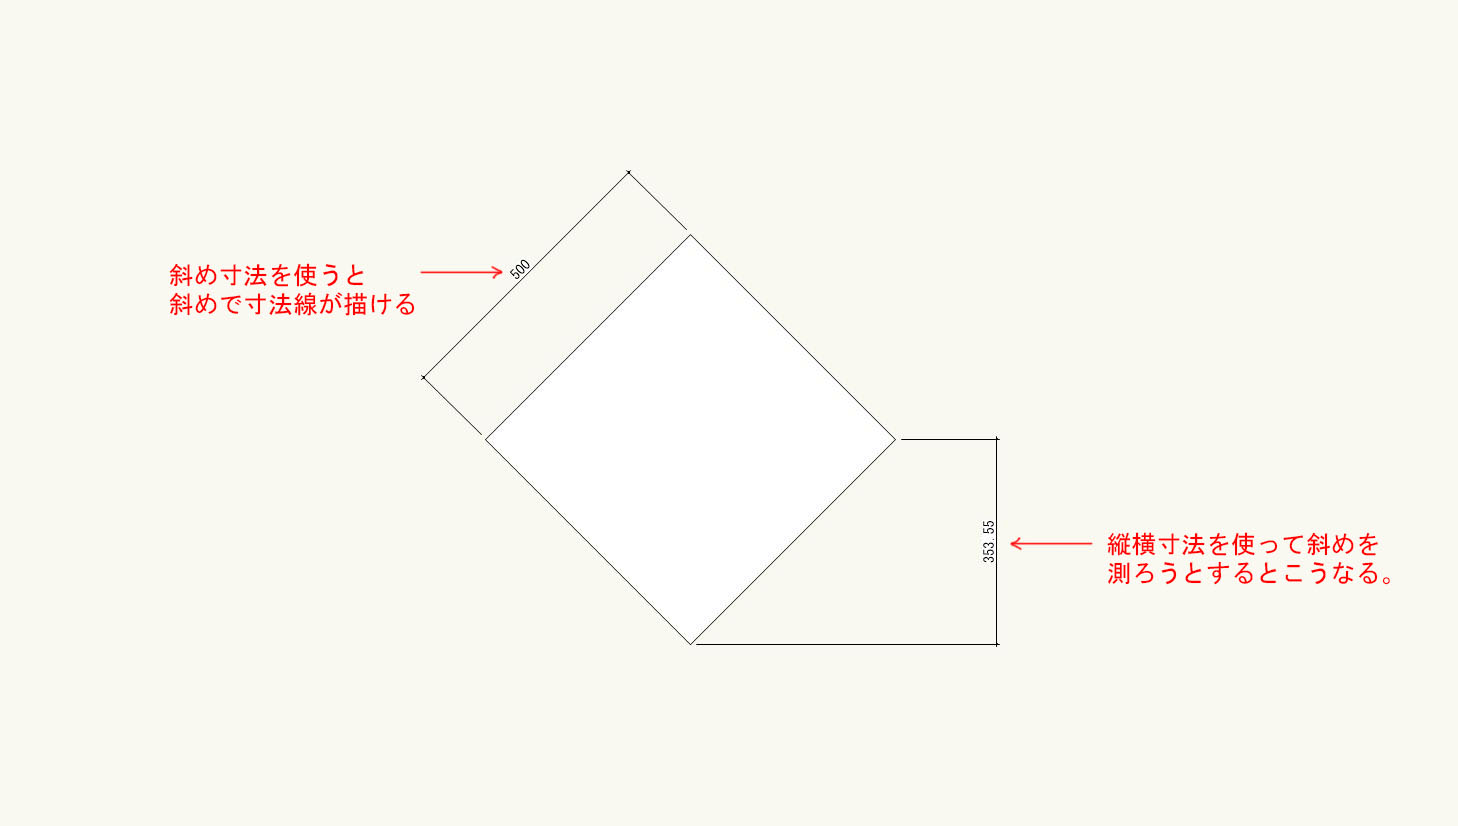 Vectorworksの斜め寸法の使い方。「斜め標準寸法」モードと「斜め直列寸法」モードについて